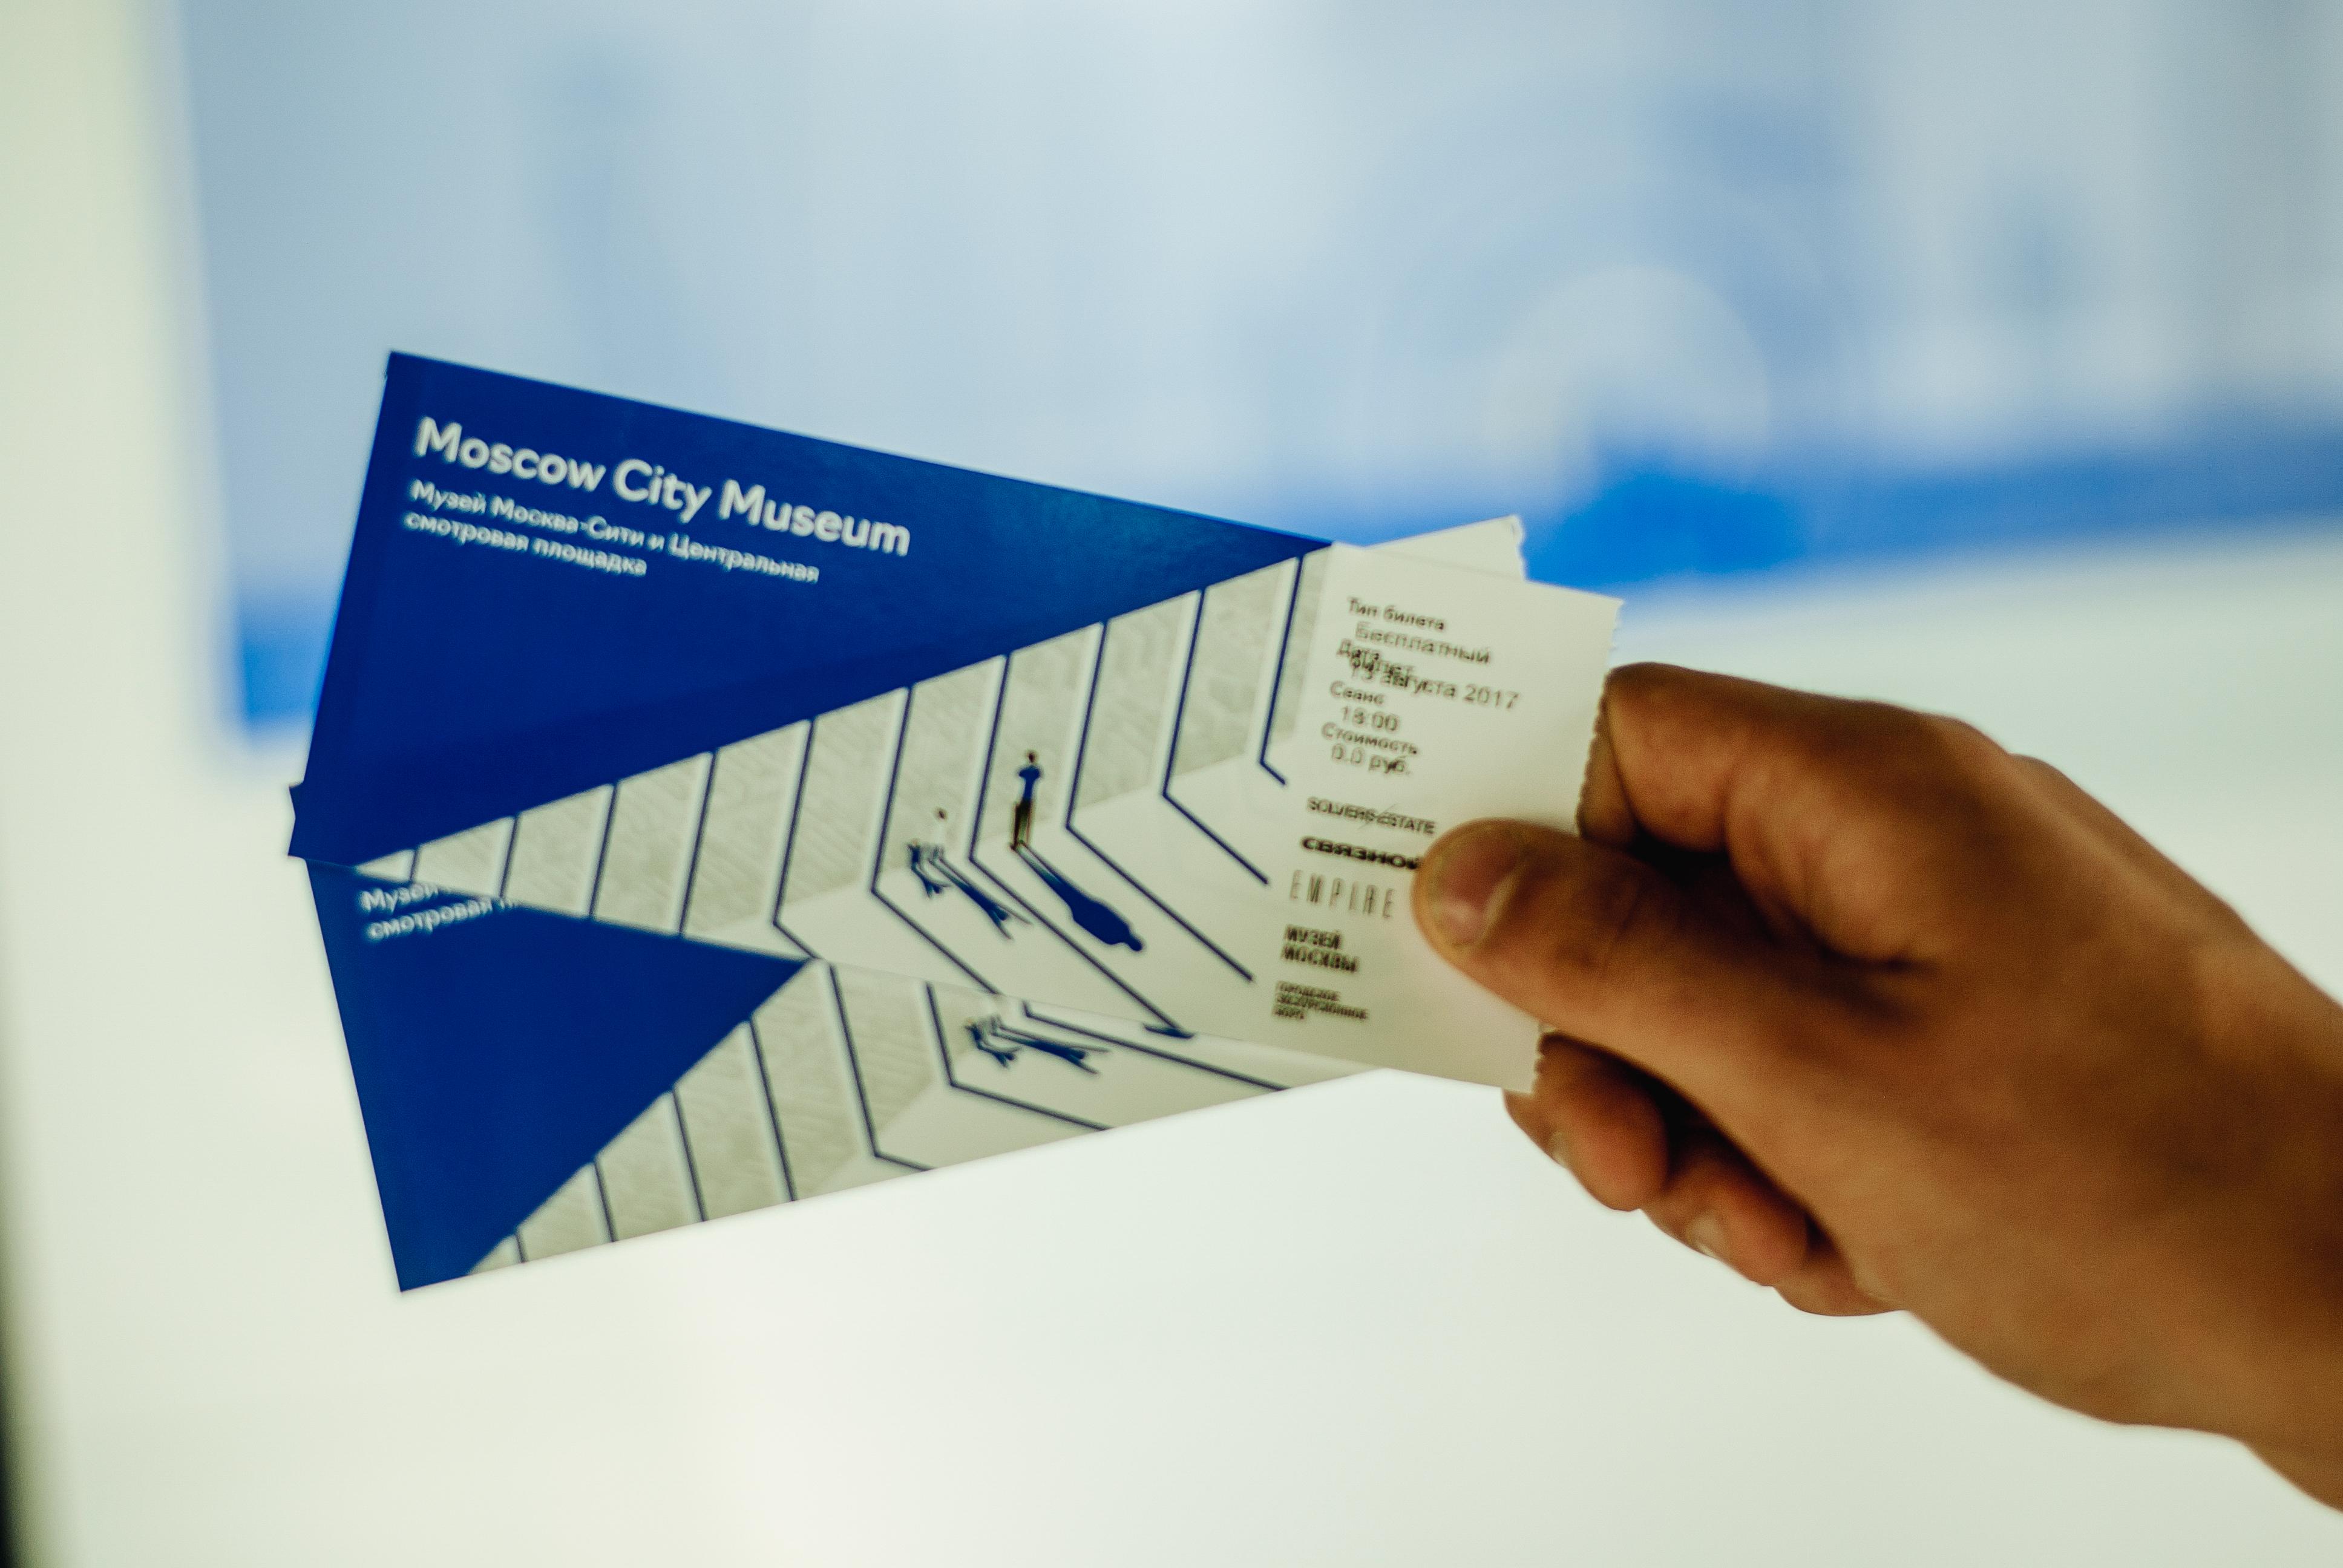 билеты в Музей Москва-ситив башне Империя